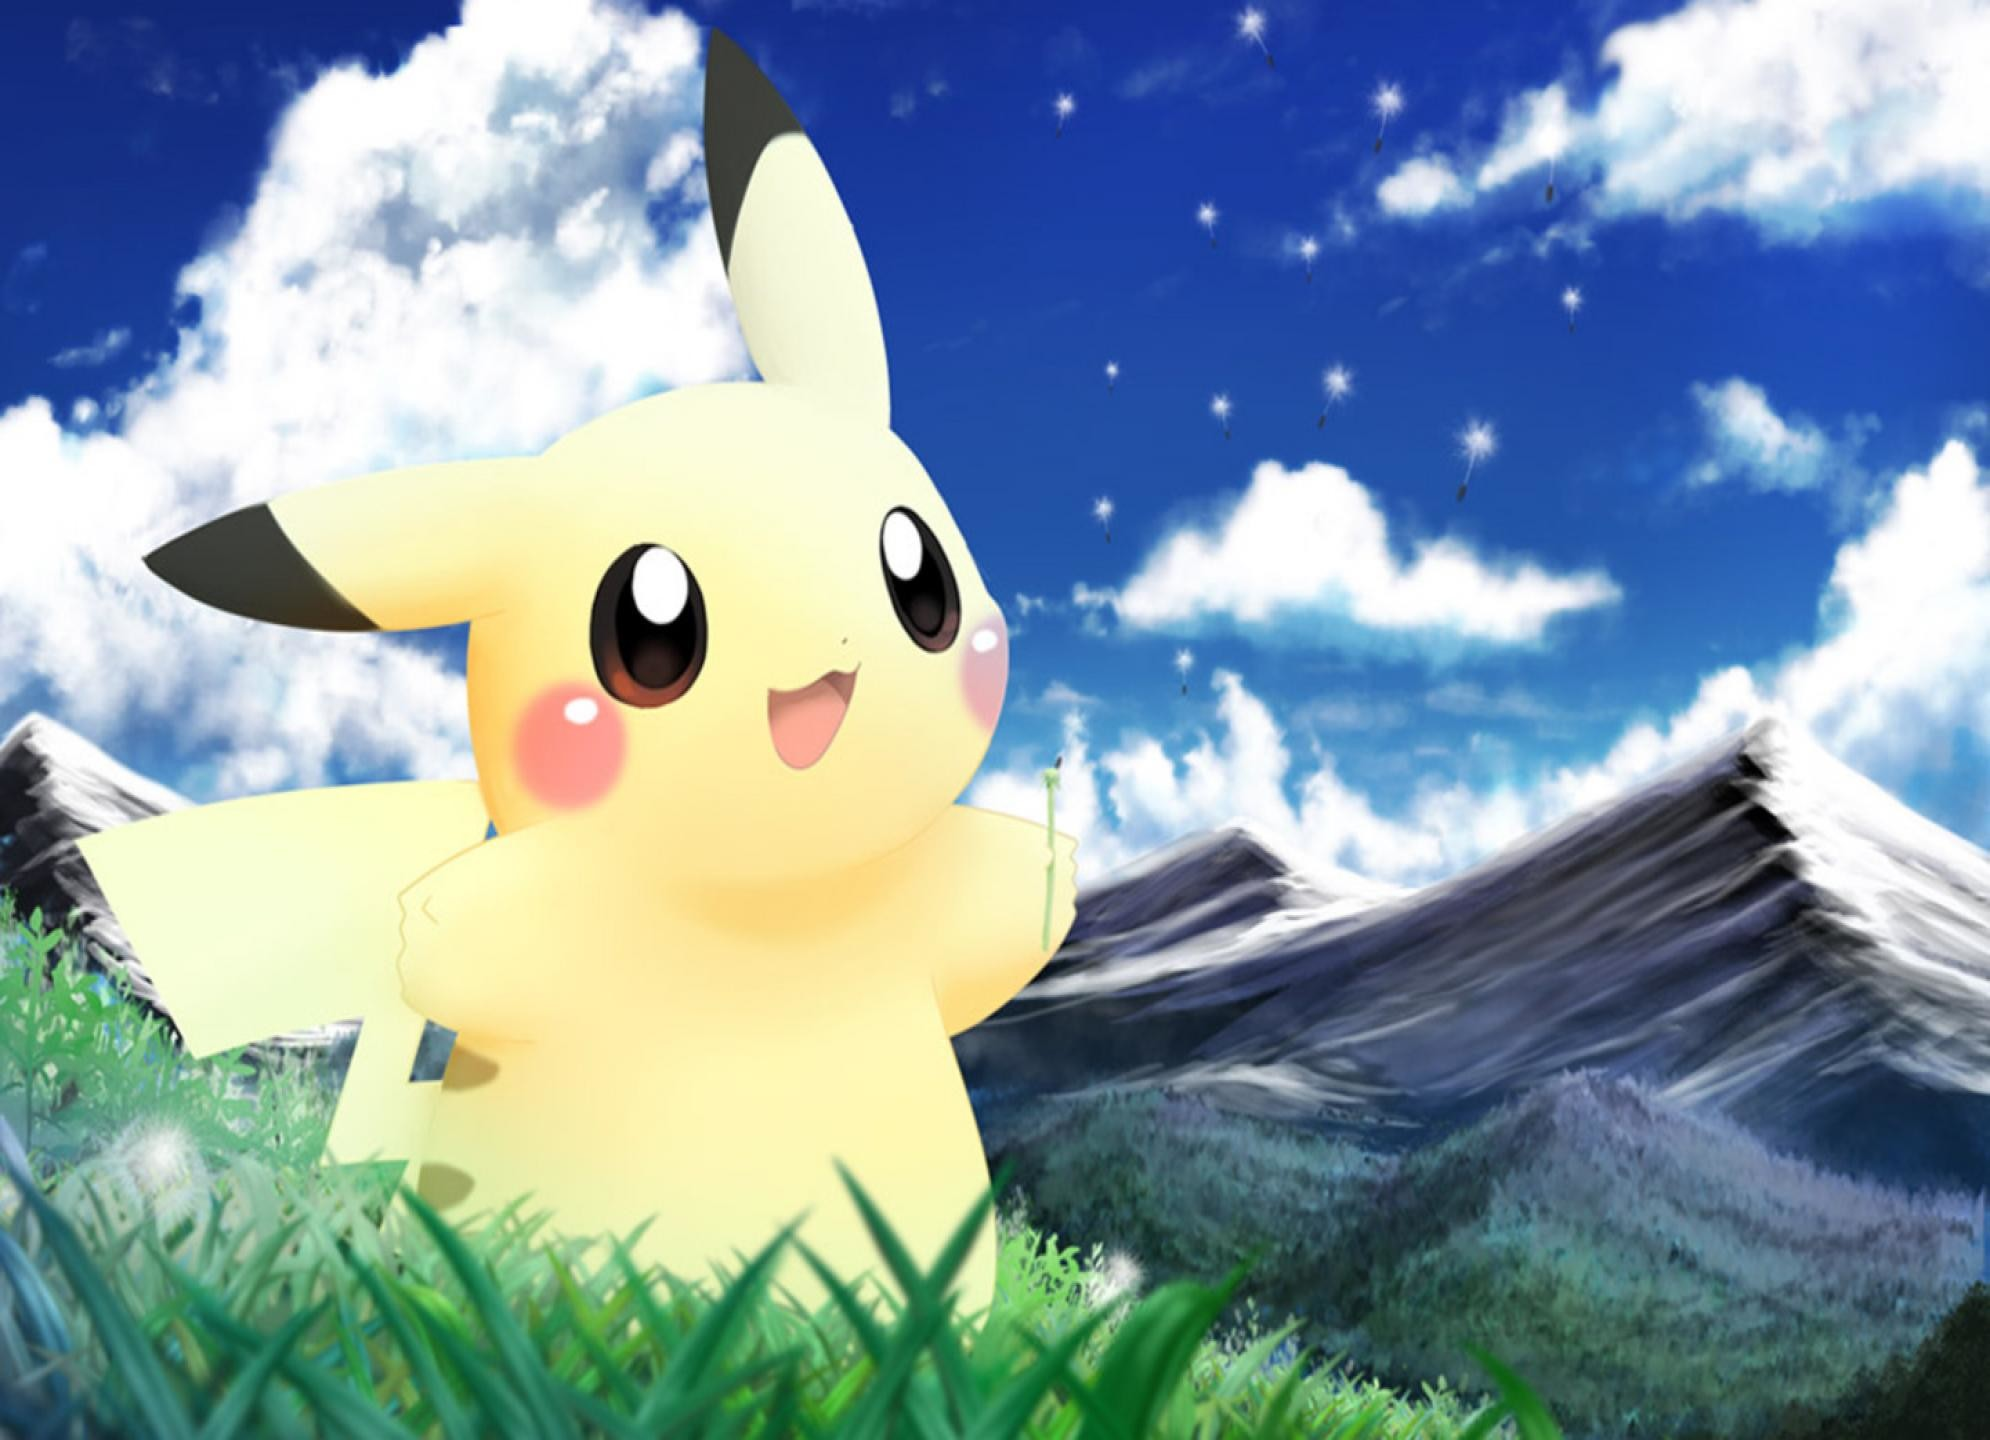 Cute Pikachu Wallpaper | cute-pikachu-wallpaper-5119-hd-wallpapers.